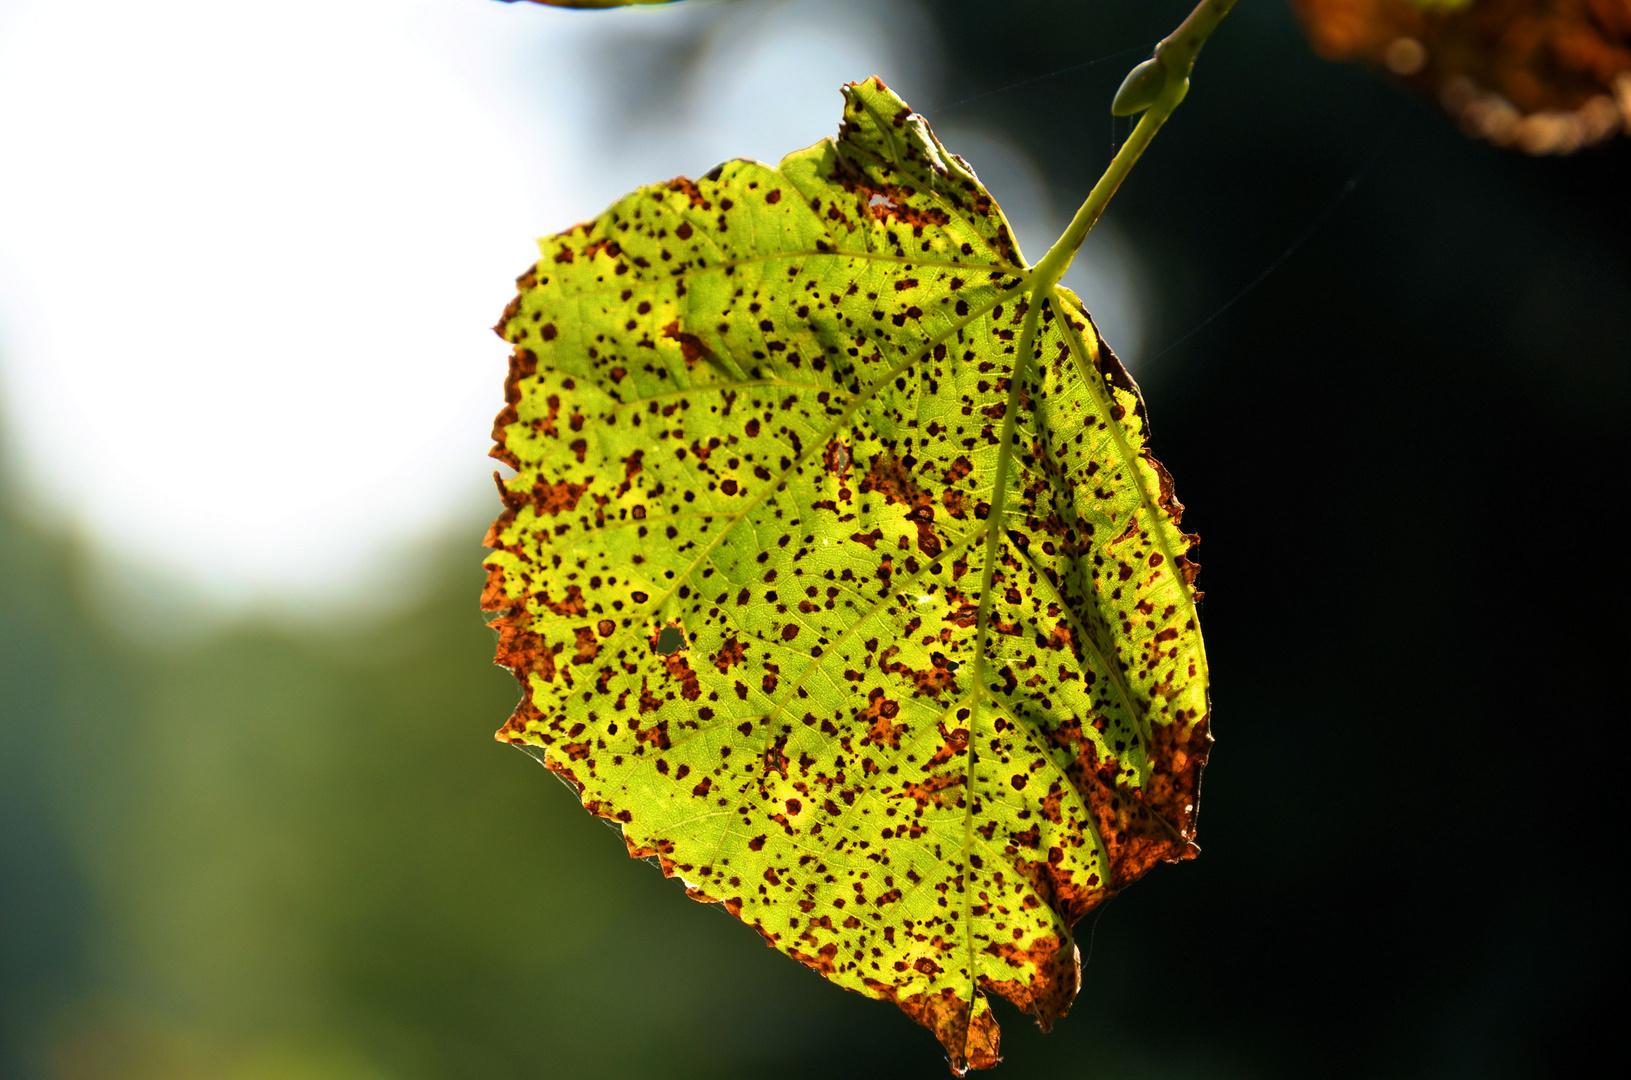 Der Herbst kommt näher